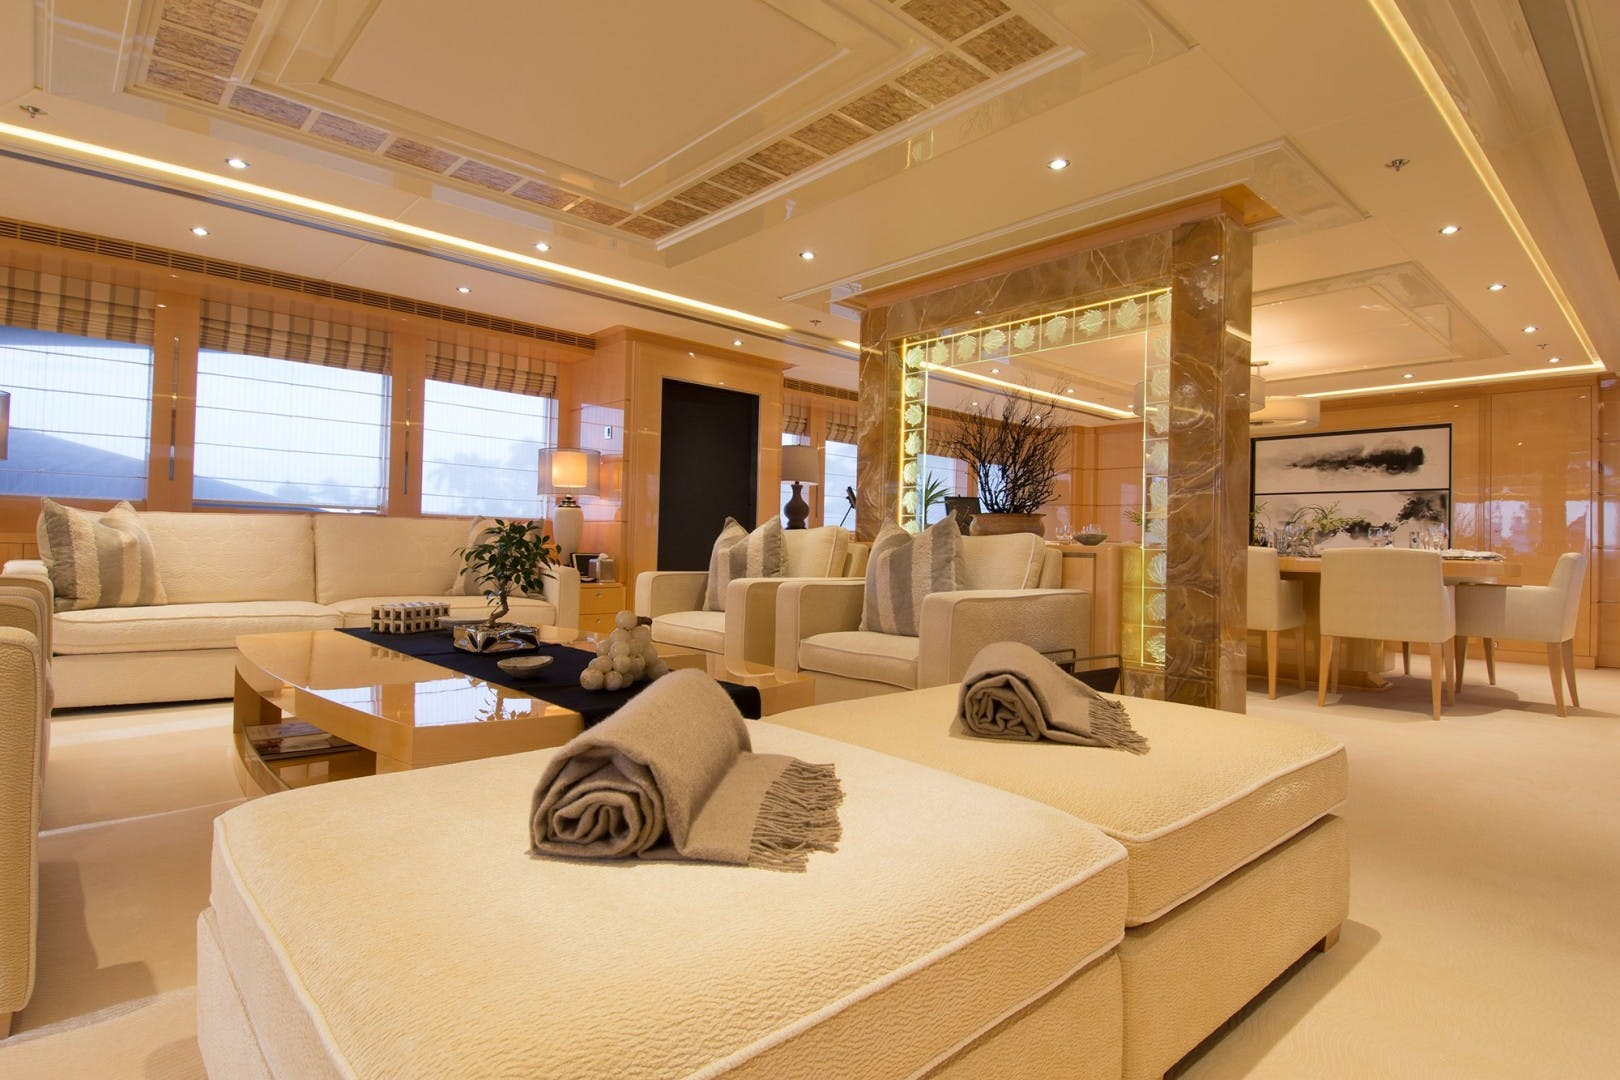 2011 Heesen Yachts 180' Lloyds, LY2/MCA Abbracci | Picture 6 of 11